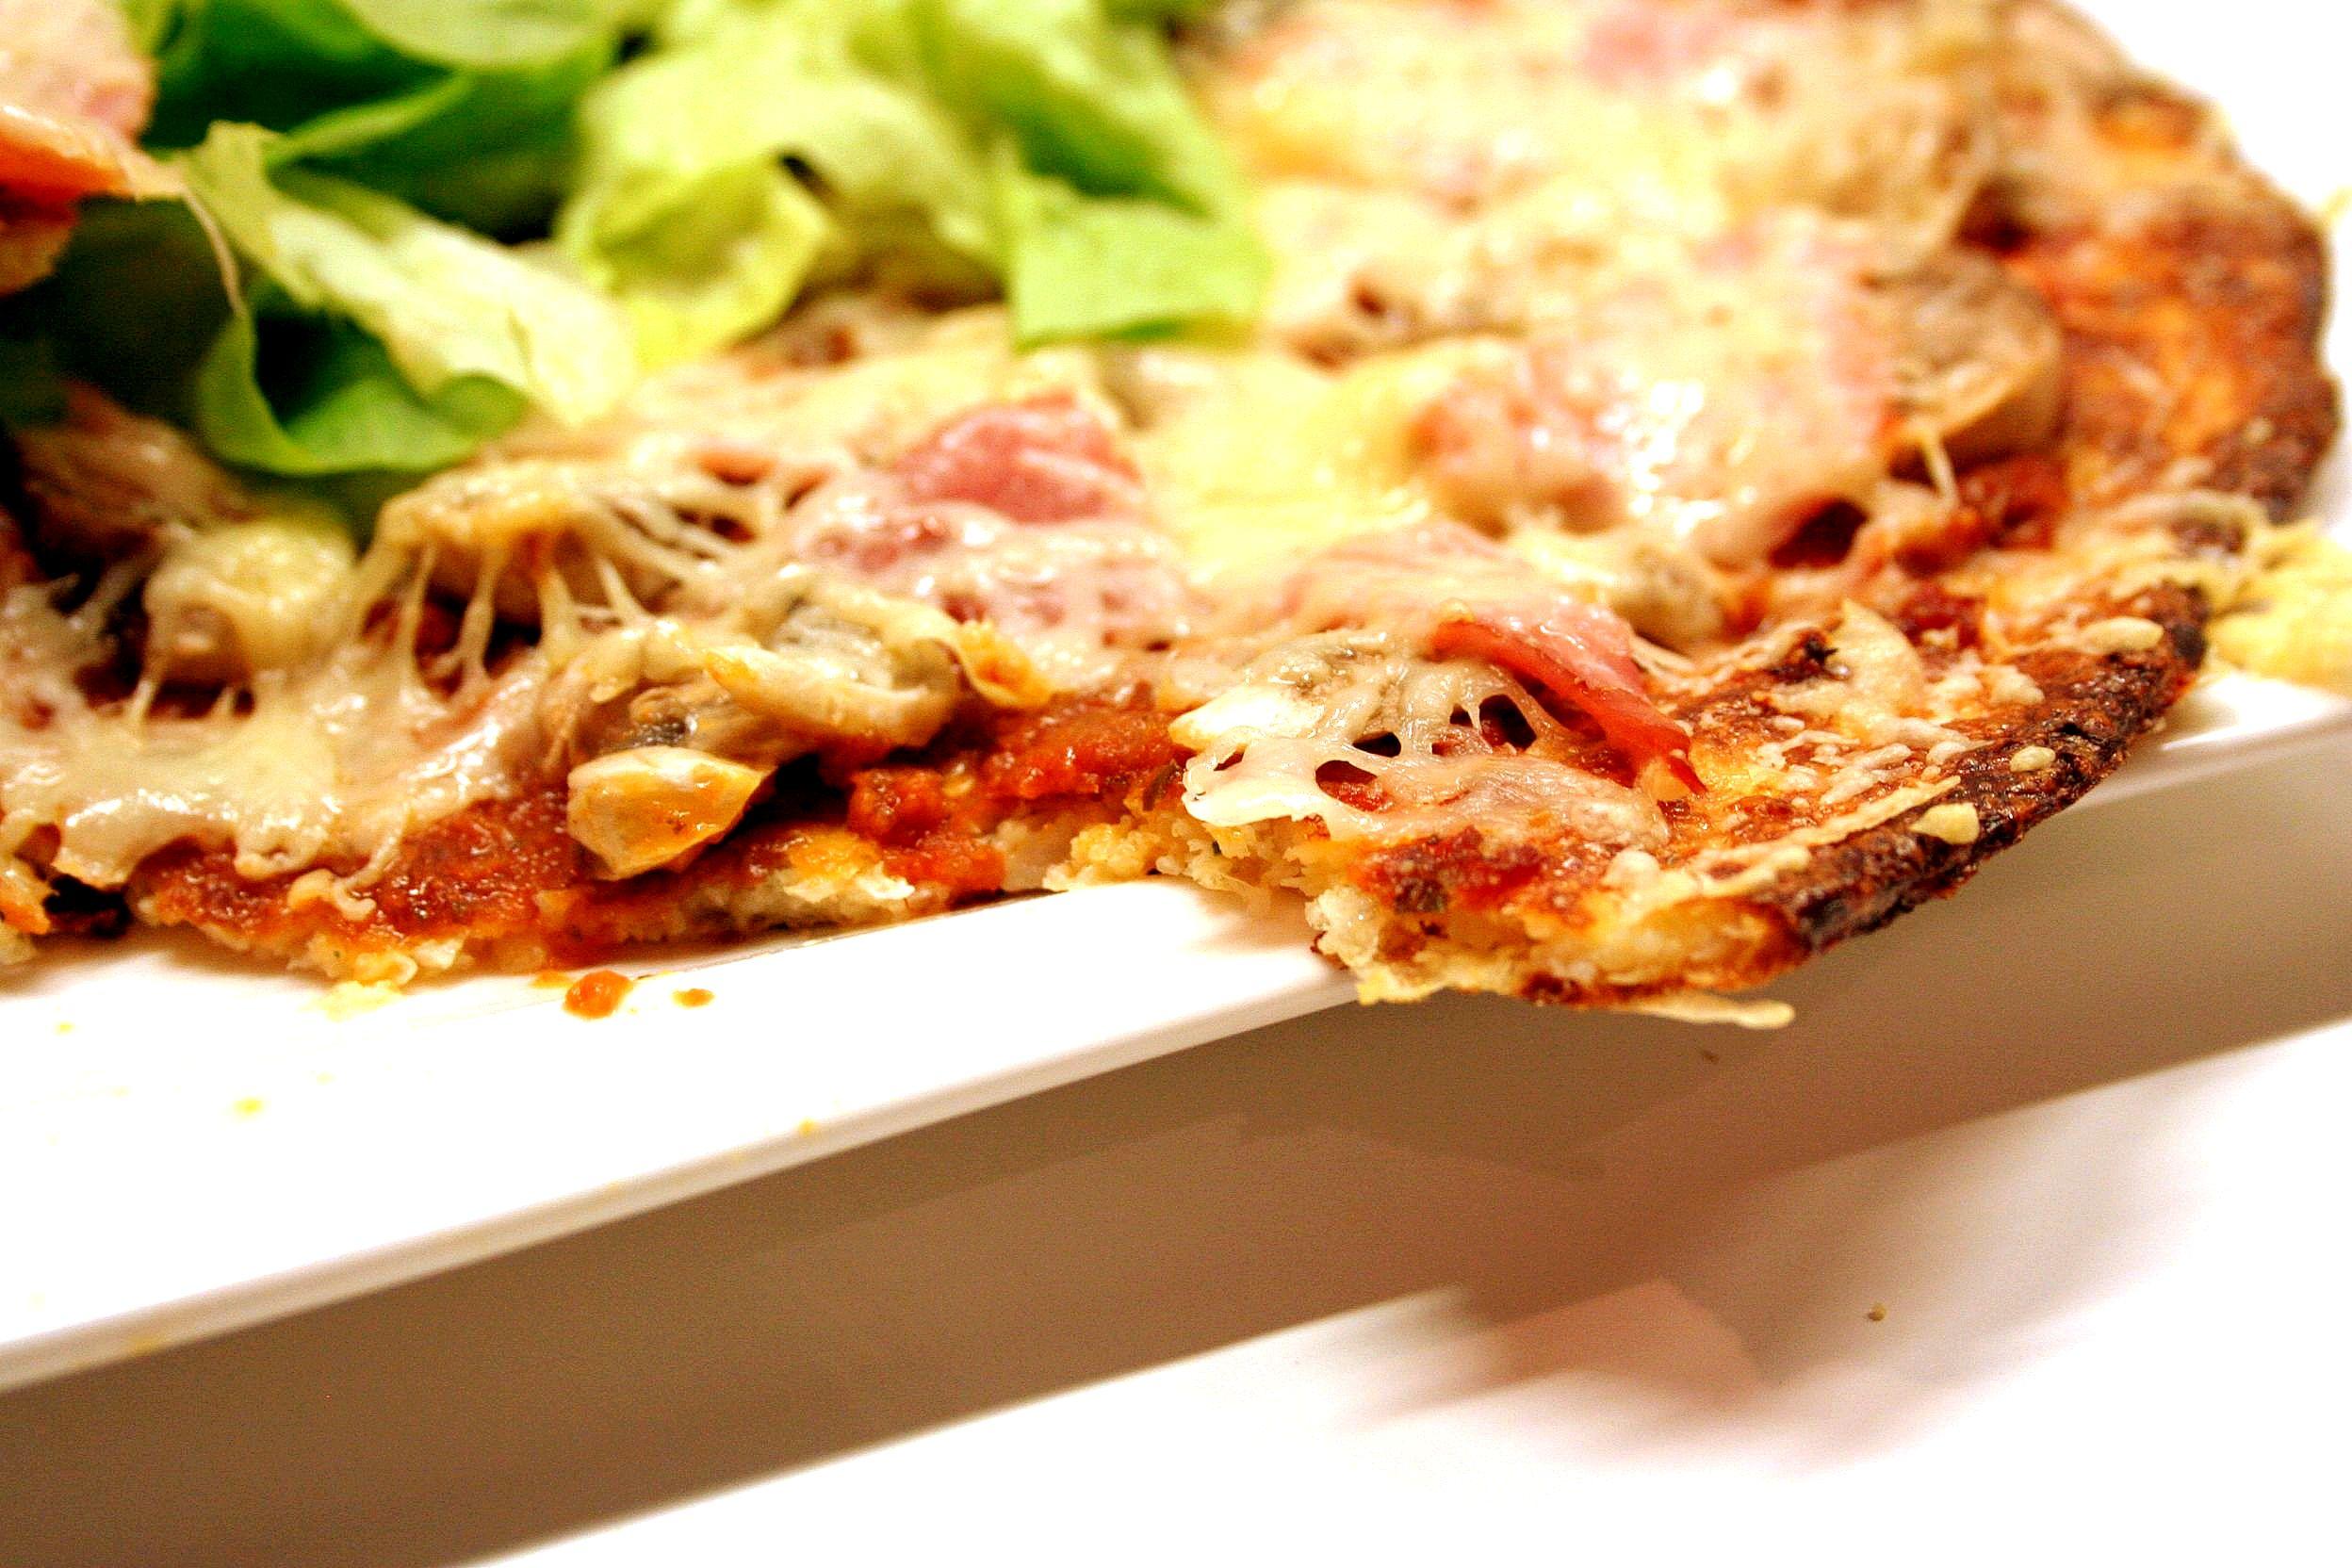 p te pizza base chou fleur sans gluten cooking mumu. Black Bedroom Furniture Sets. Home Design Ideas